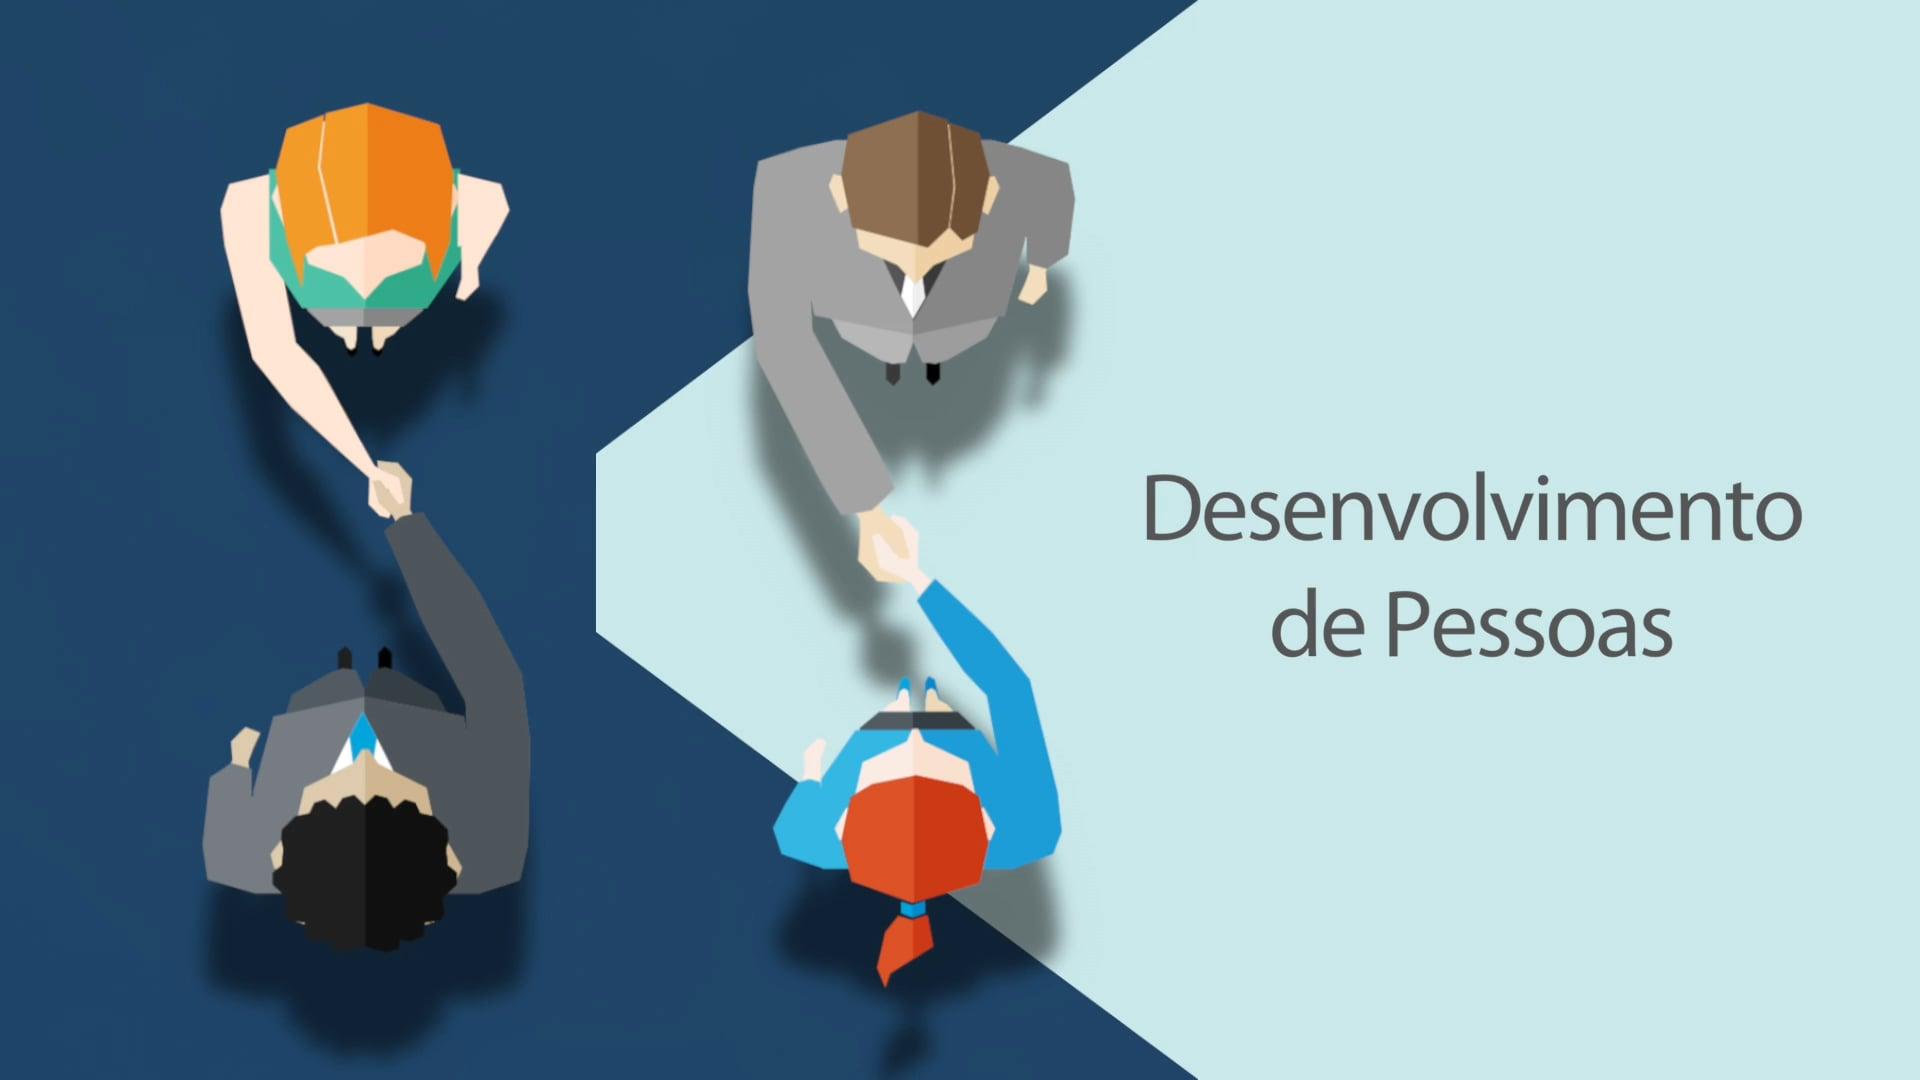 Processo de Desenvolvimento Porto Seguro